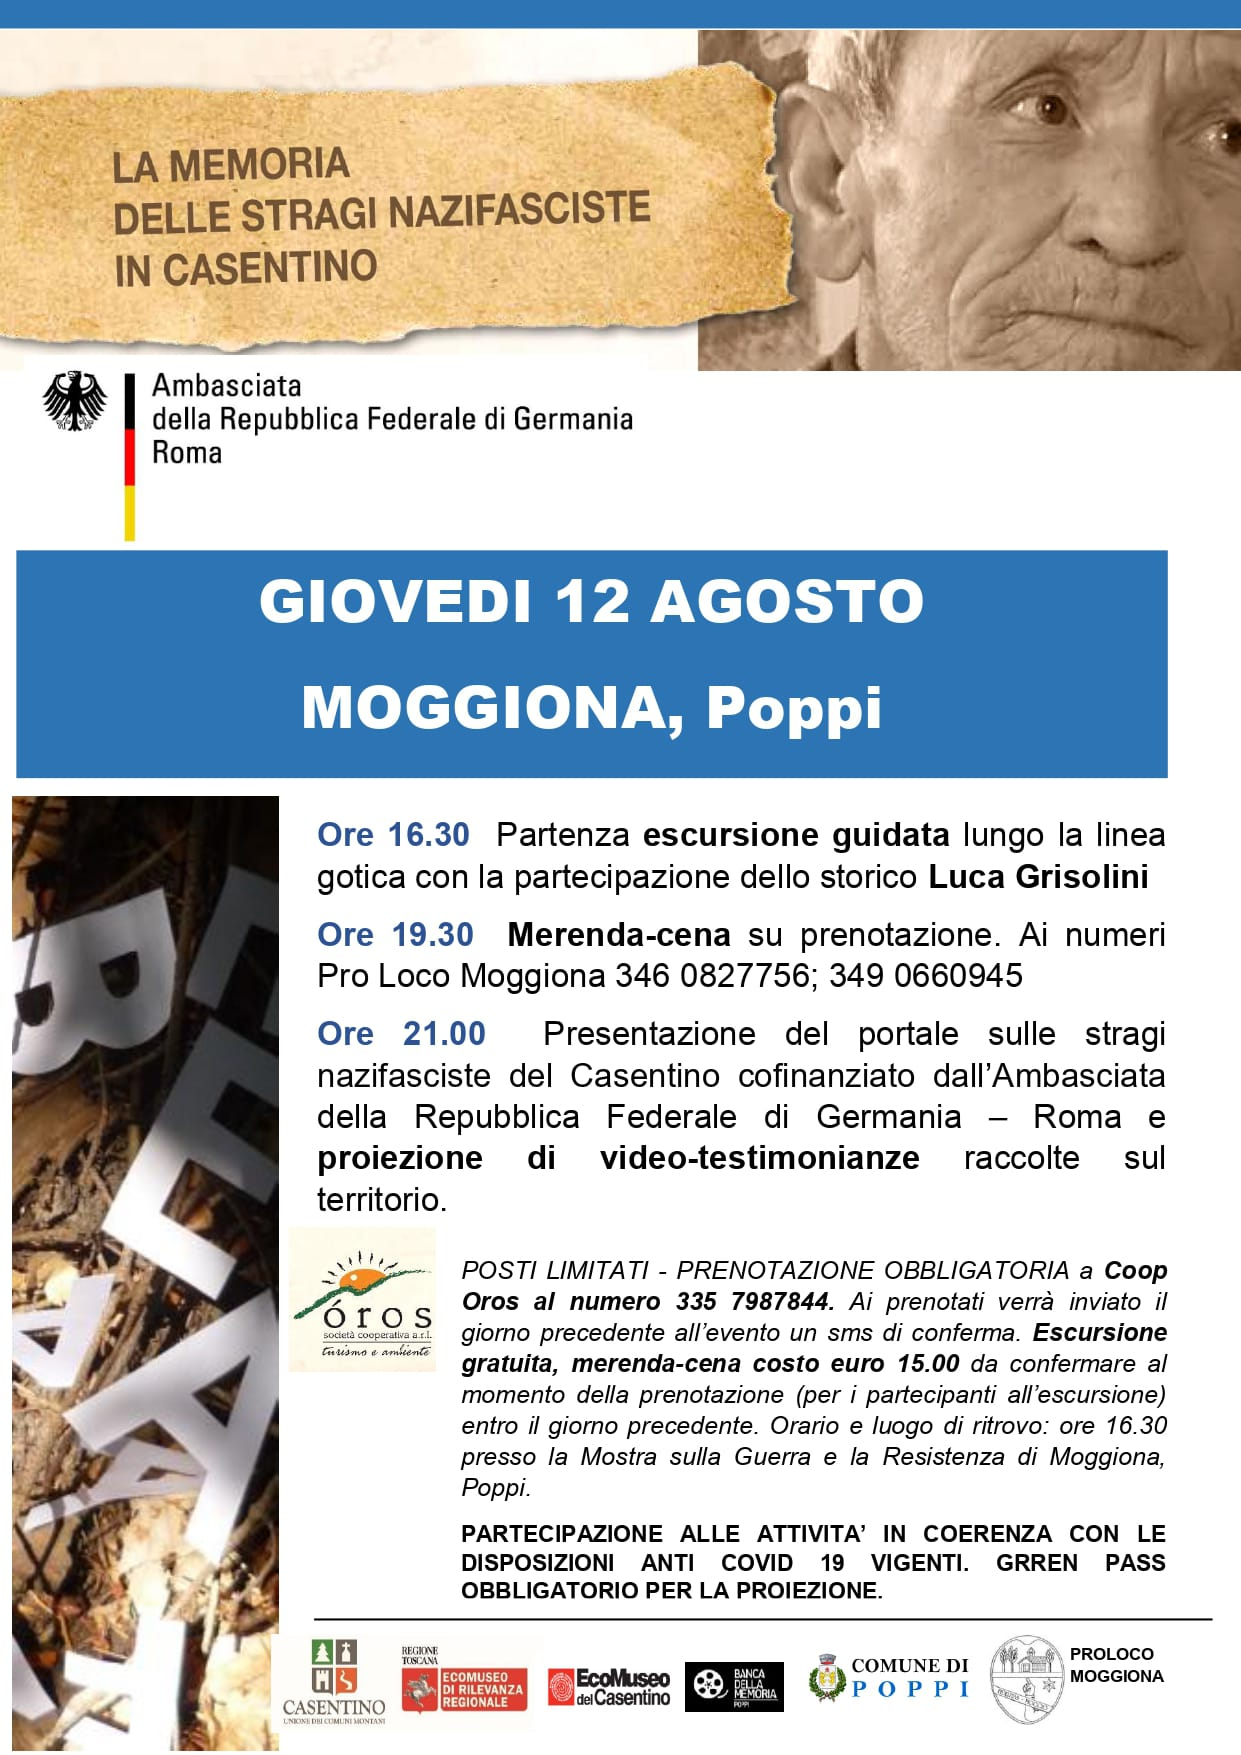 Moggiona, Poppi (AR)